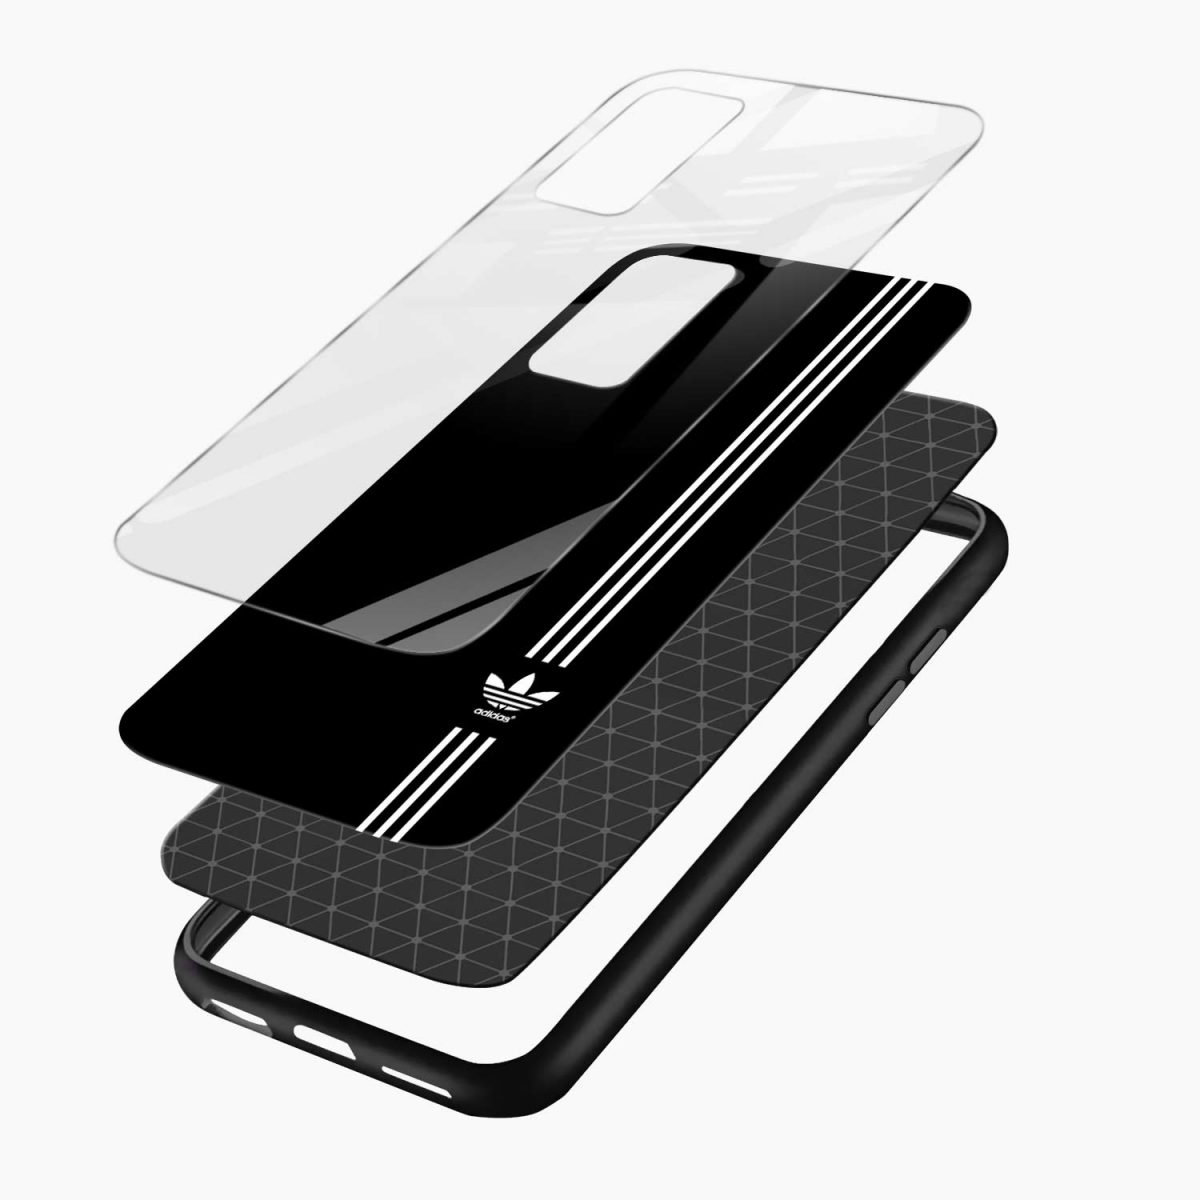 white strips adidas xiaomi mi 10t pro back cover layers view